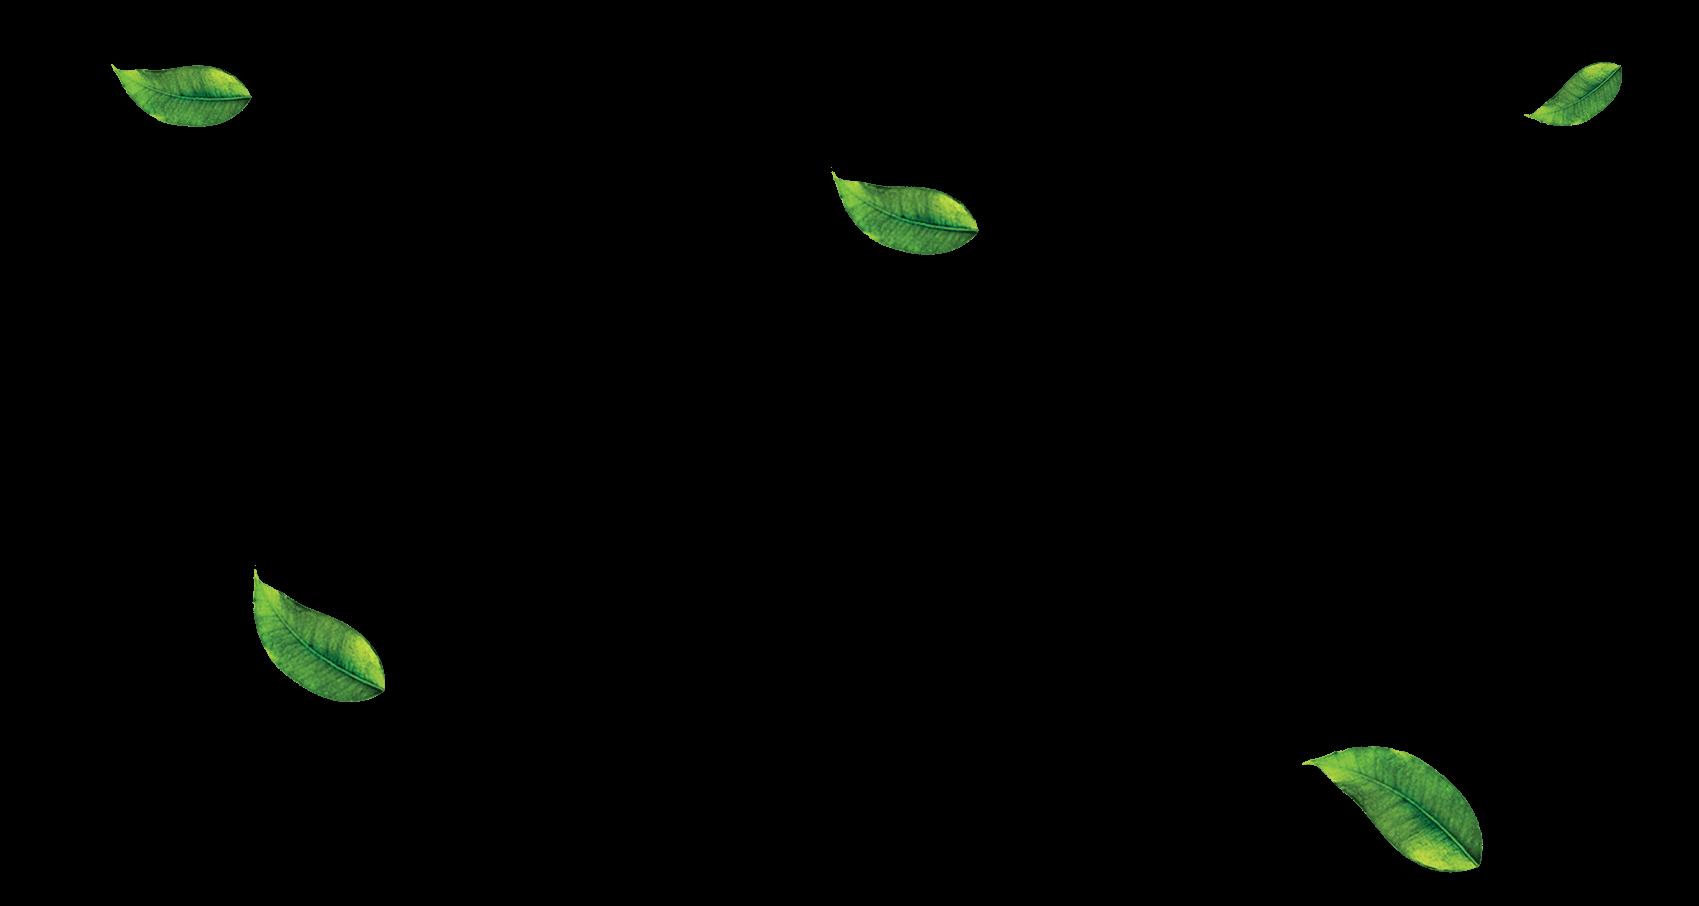 Enzo S Organic Matcha Green Tea Powder Free Shipping With